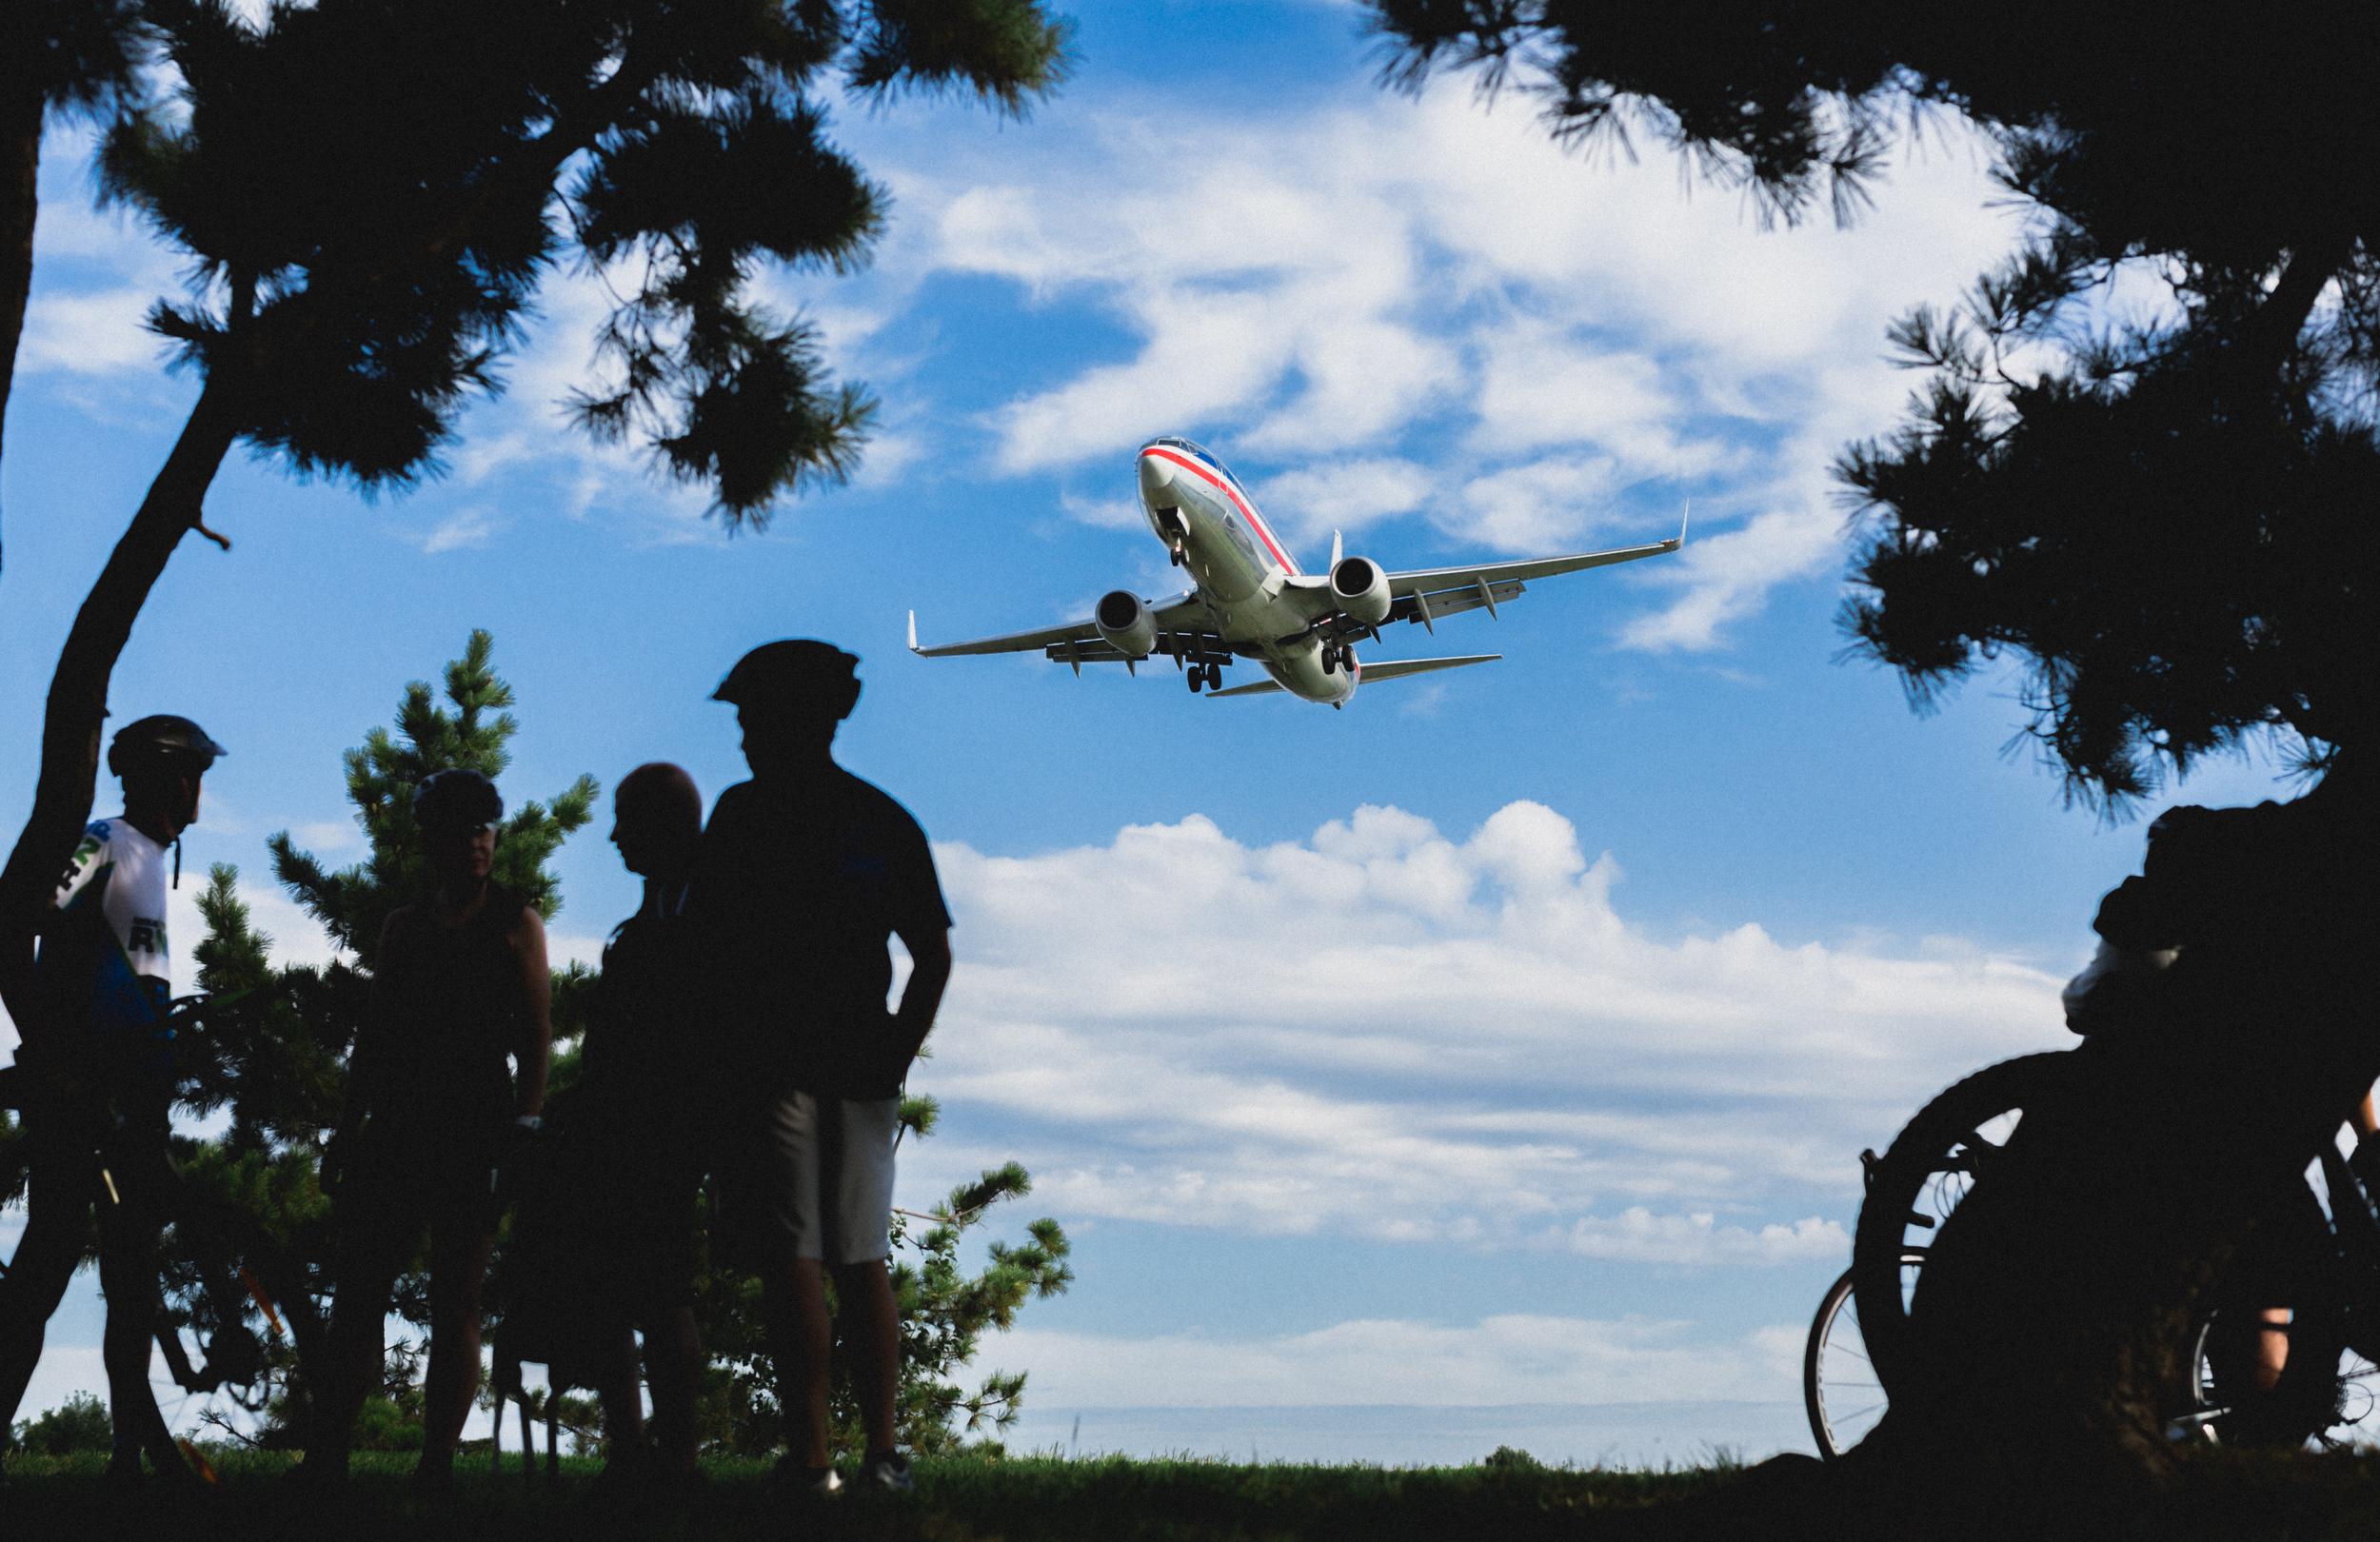 gravely point airplane-1.jpg